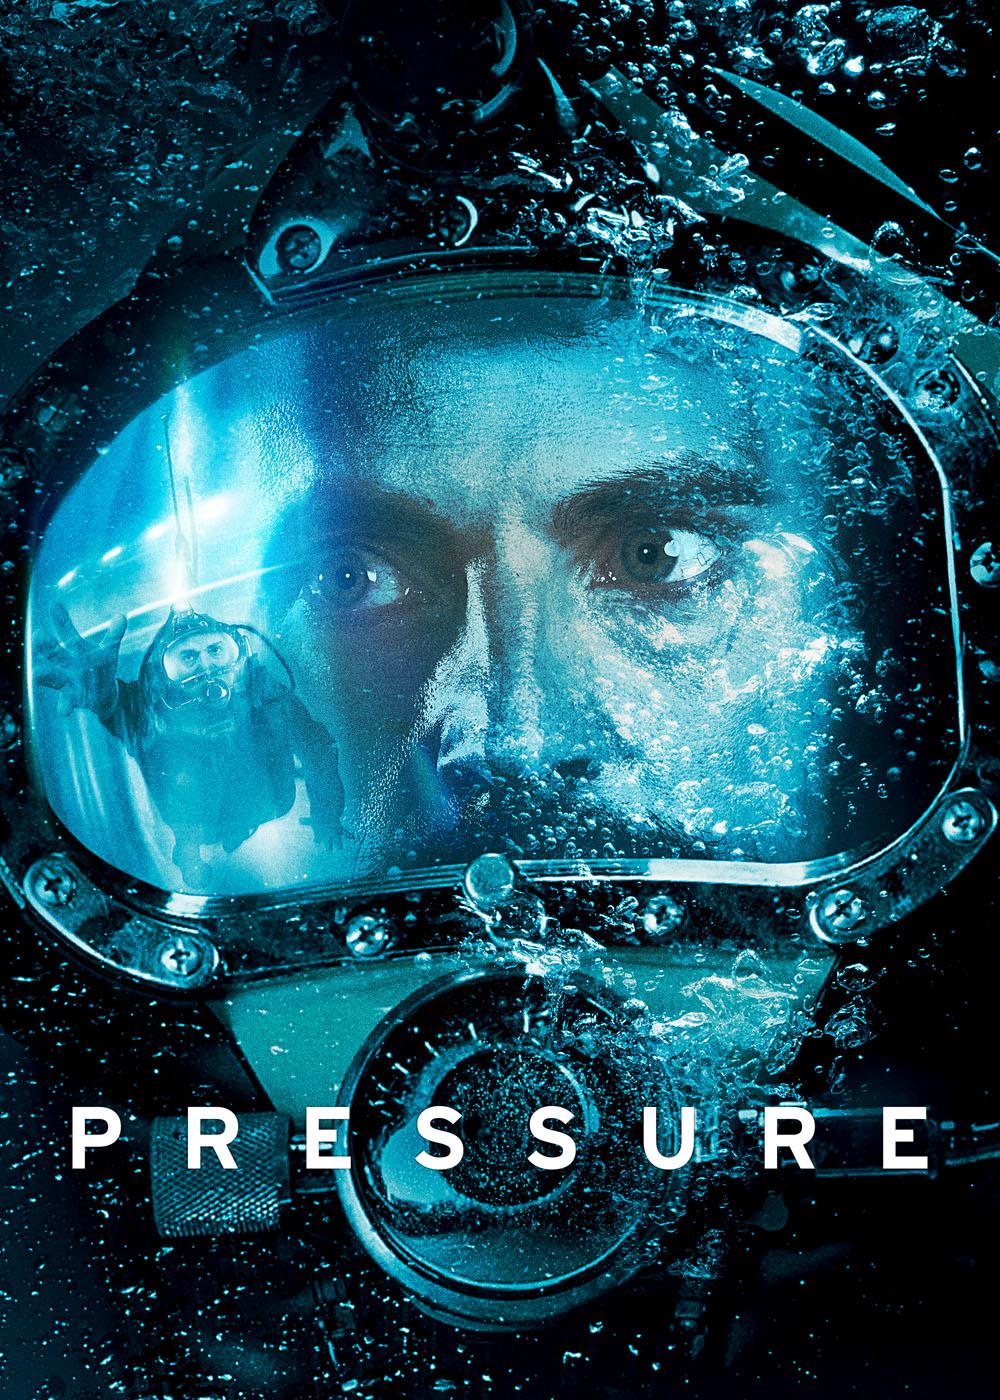 pressure_poster.jpg